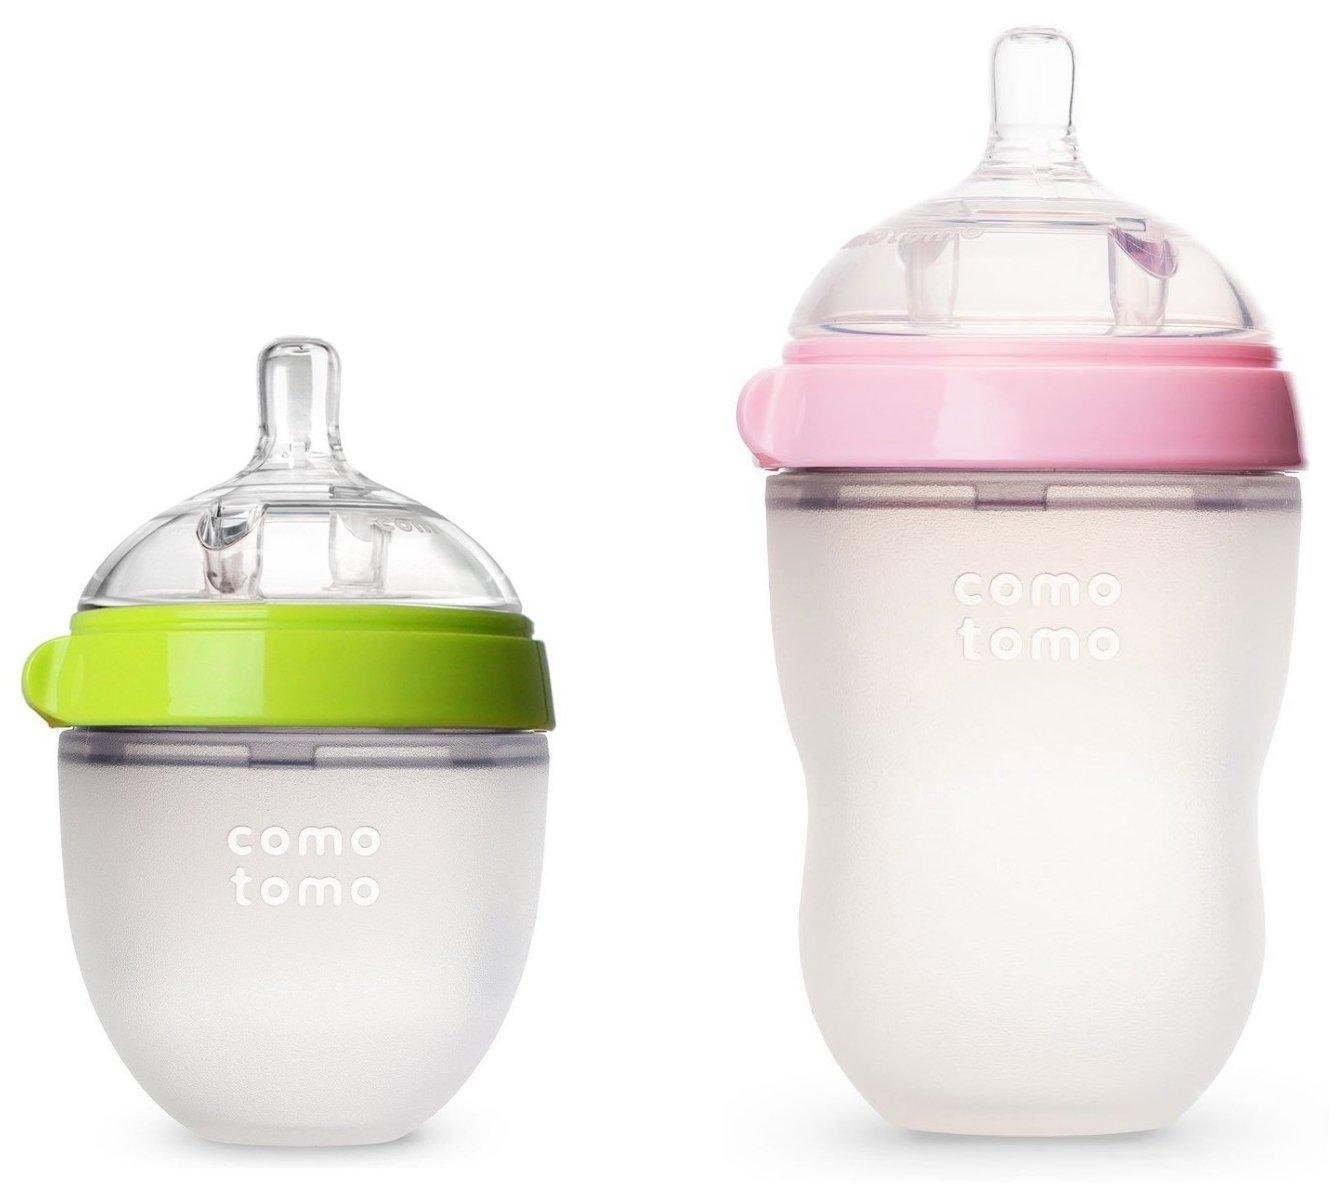 Comotomo Natural Feel Baby Bottles Set, 5oz Slow Flow and 8oz Medium Flow, Pink